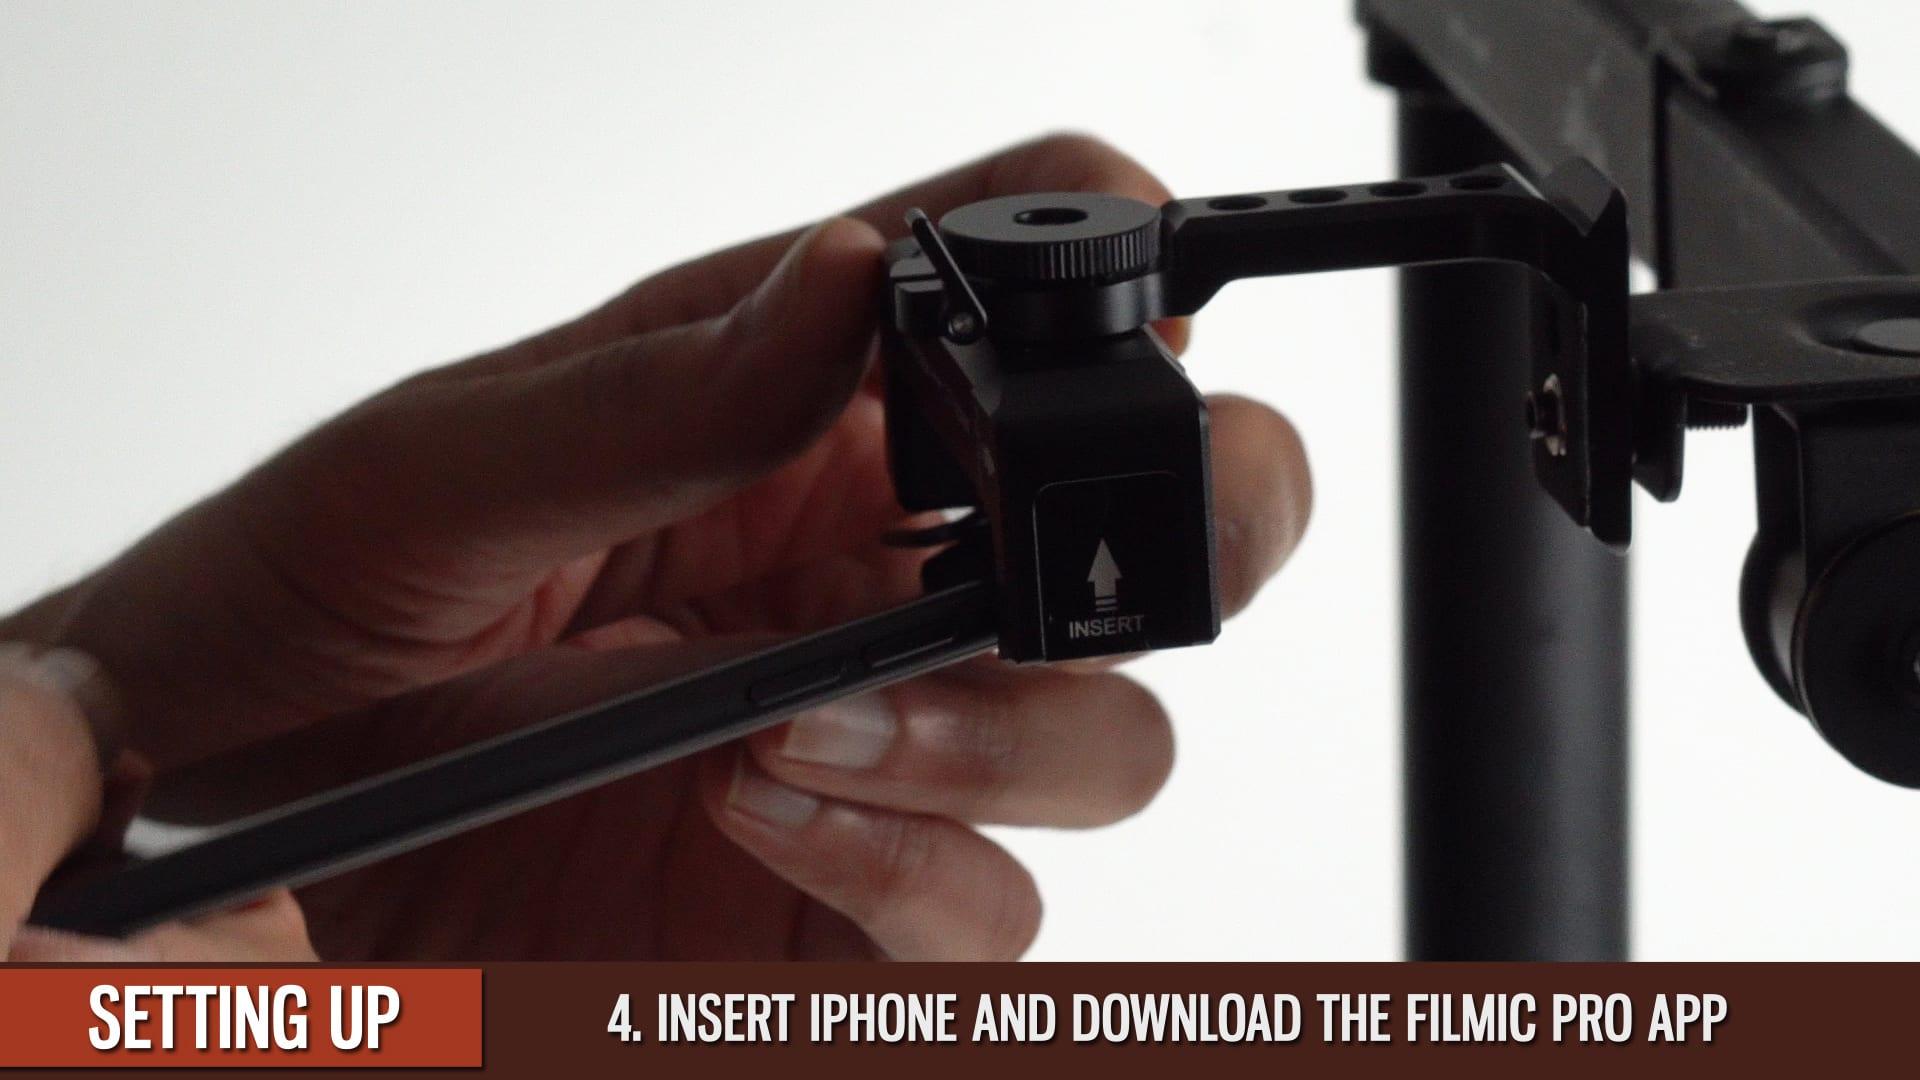 IPhone-Overhead- Insert-IPhone